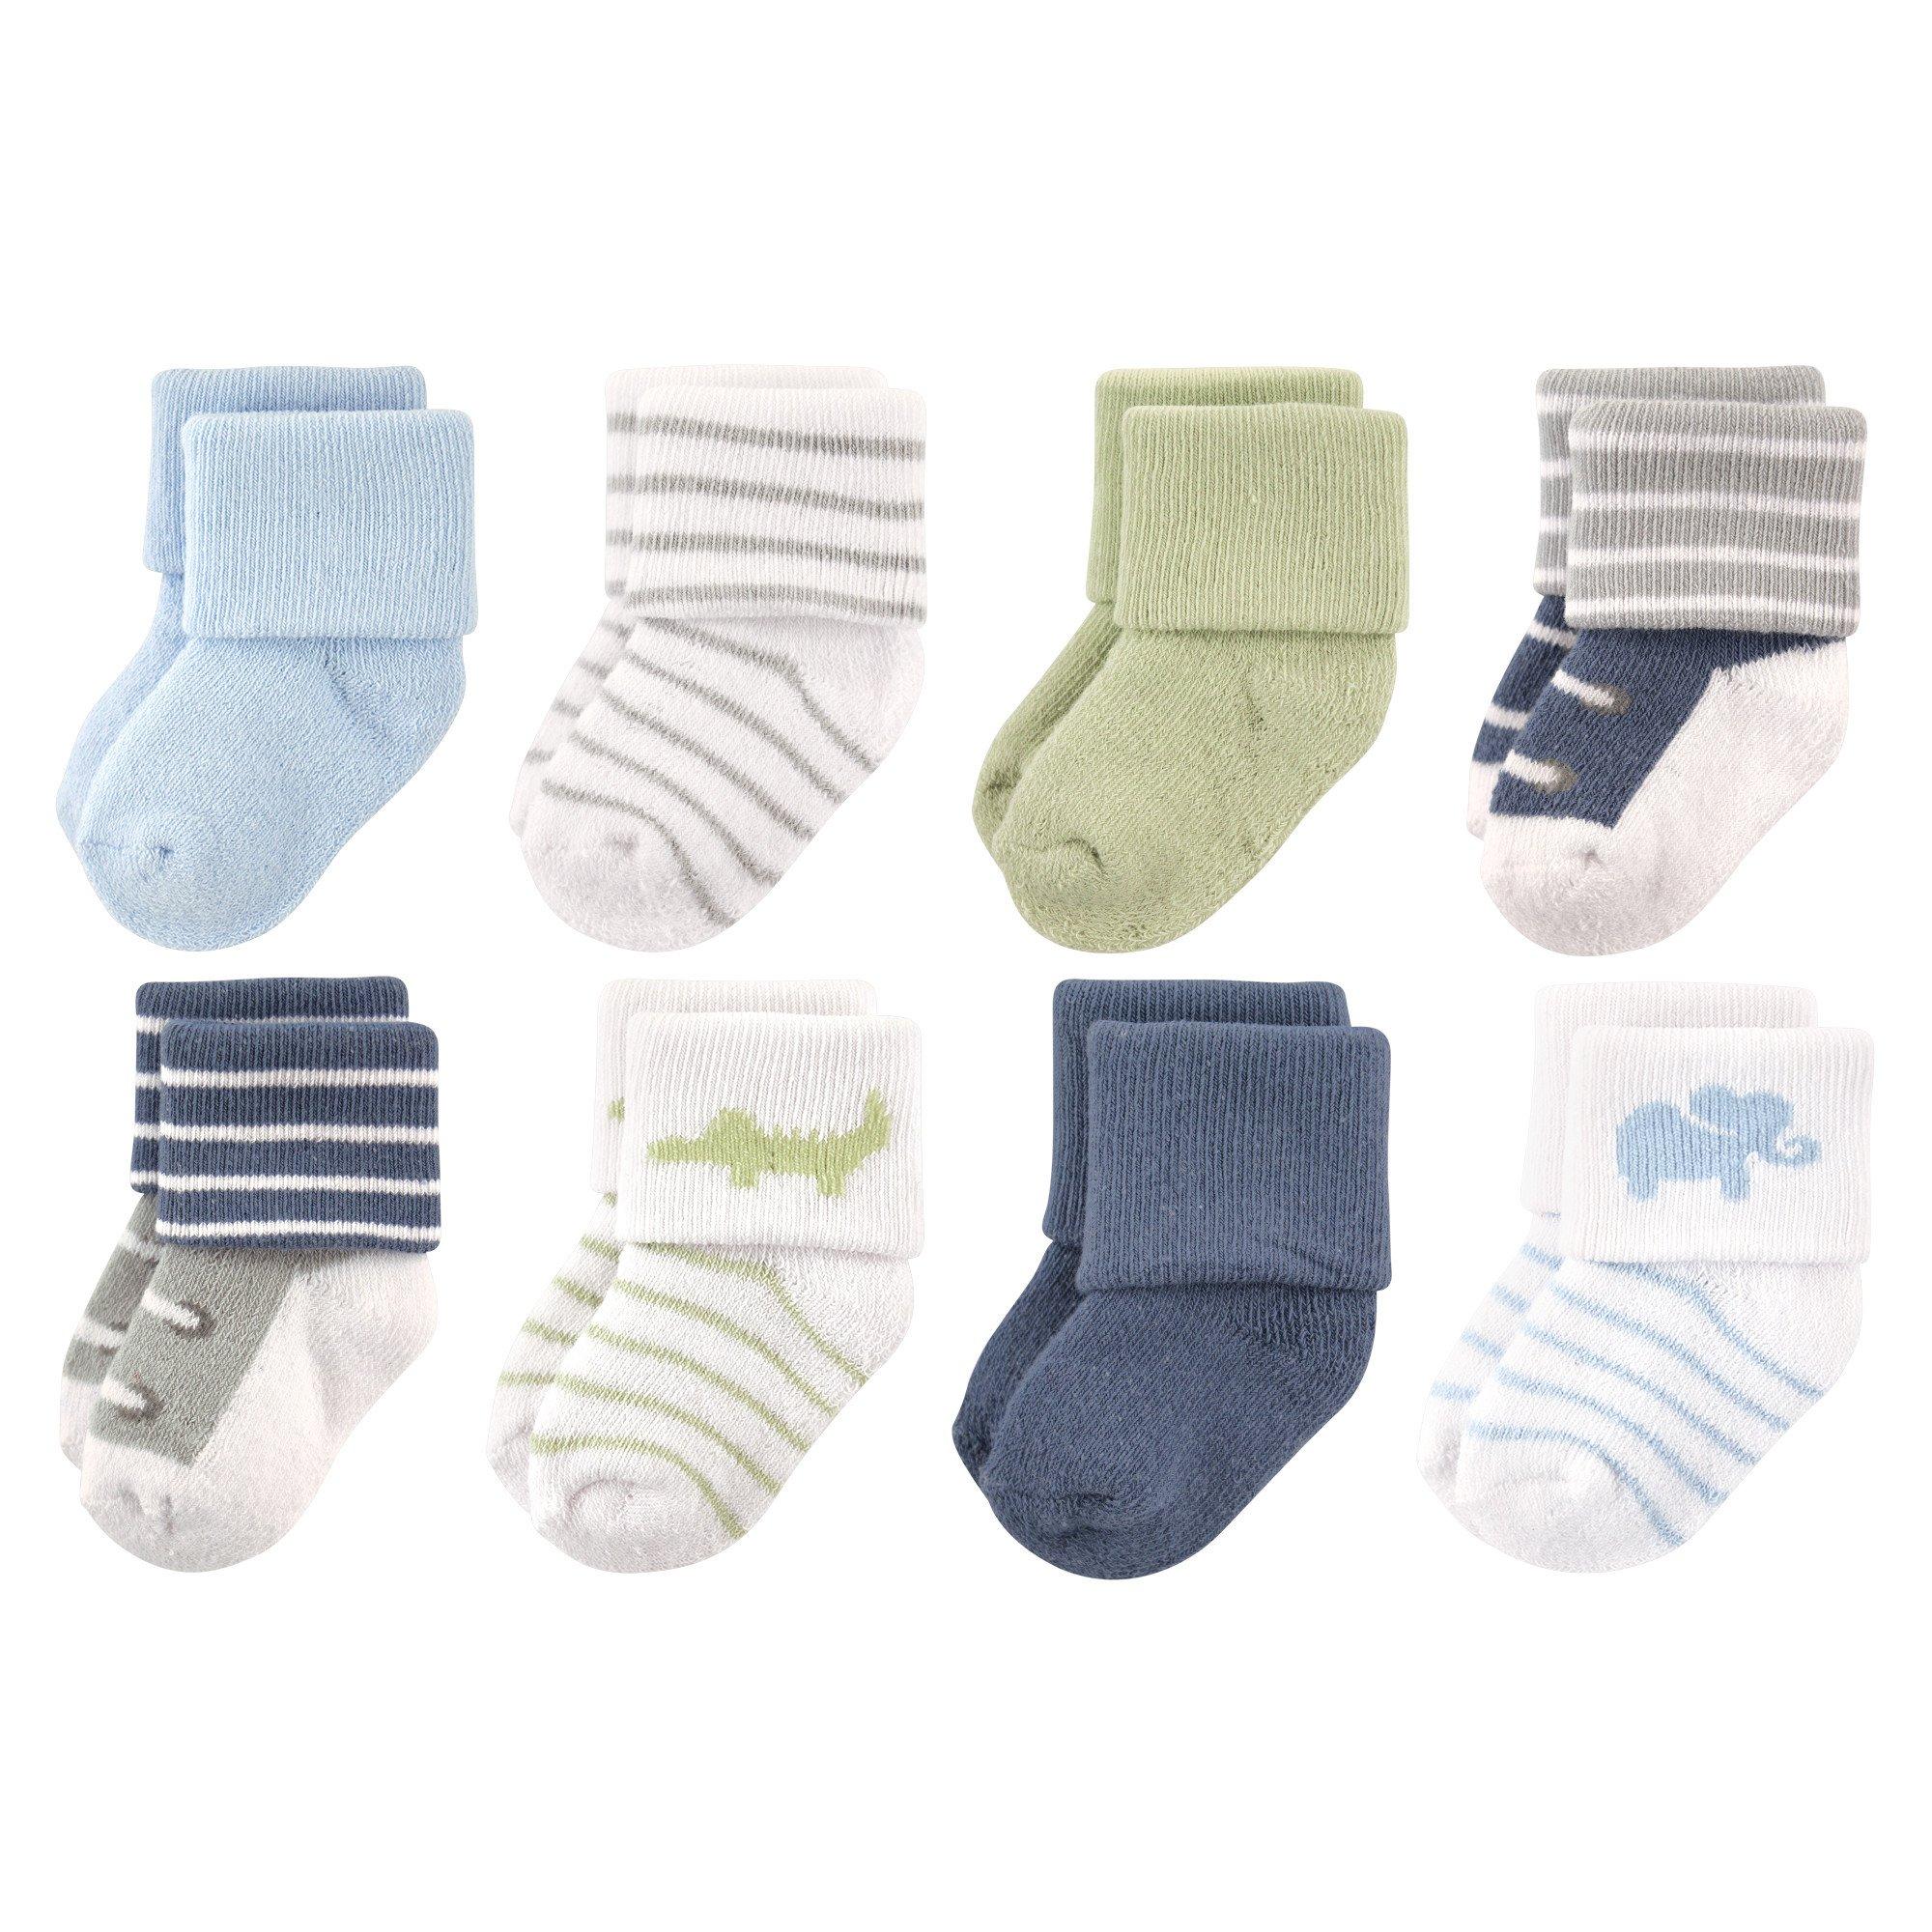 Luvable Friends Baby 8 Pack Newborn Socks, Safari, 0-6 Months